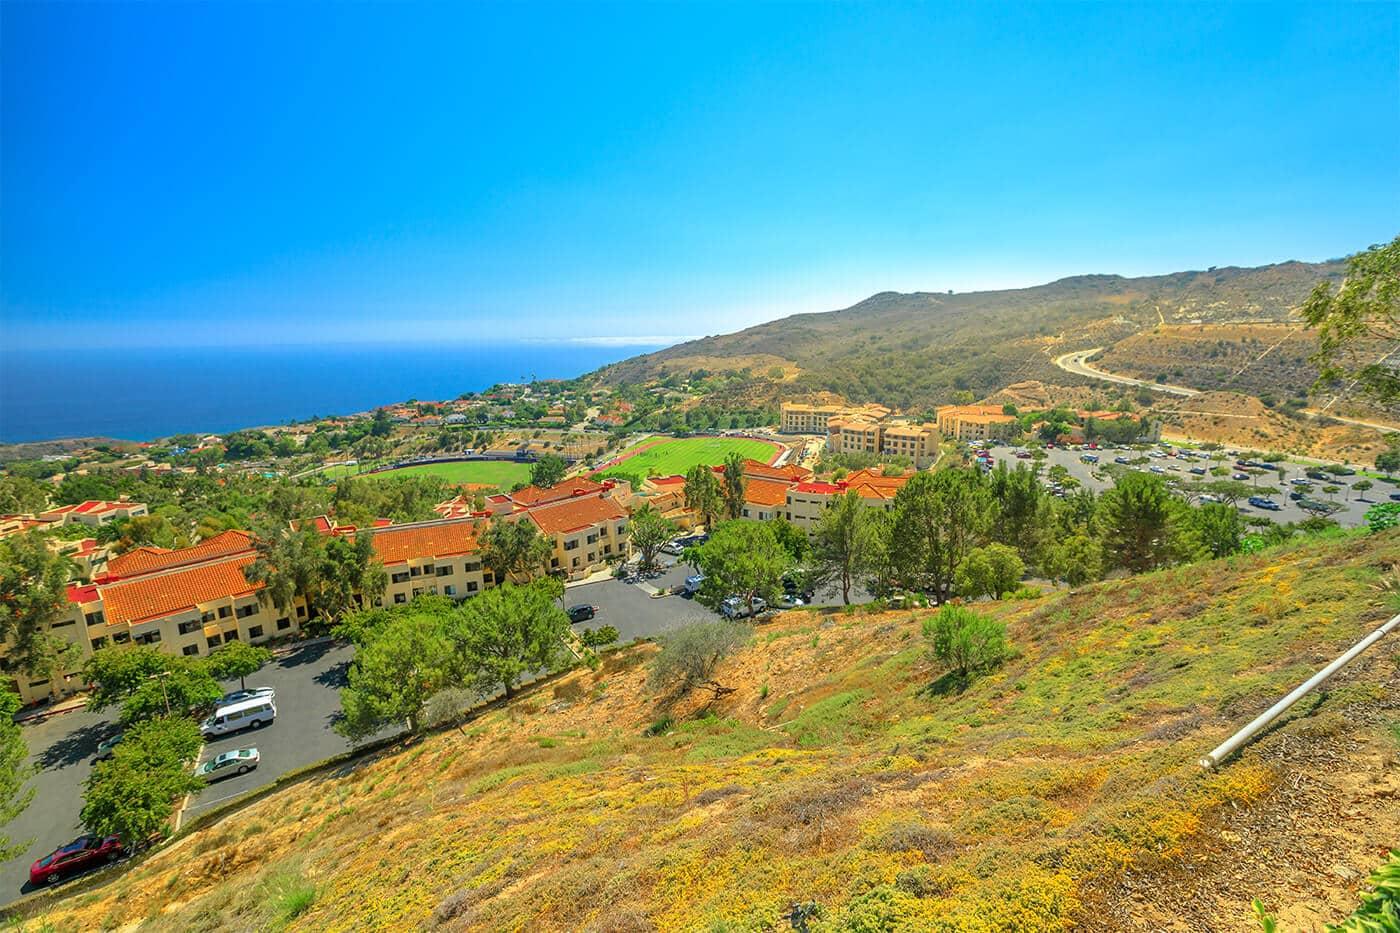 Pepperdine University in Malibu CA